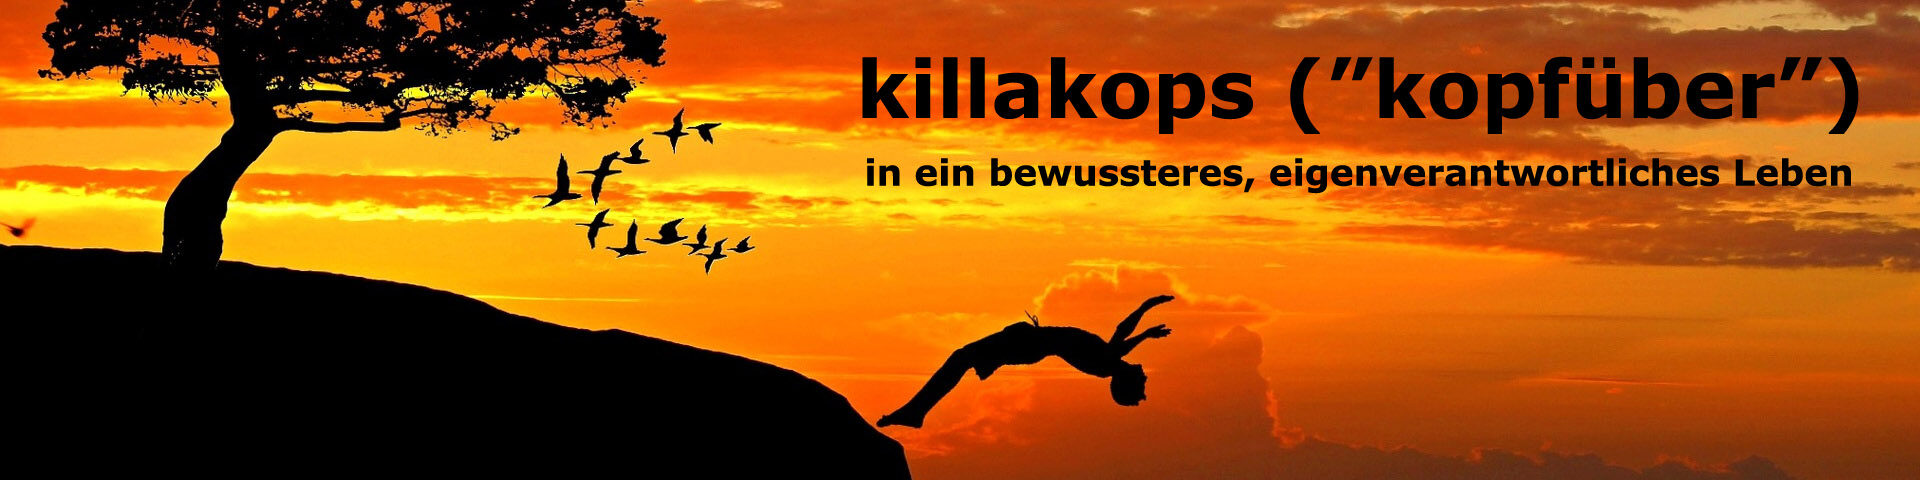 "Killakops (""kopfüber"")"